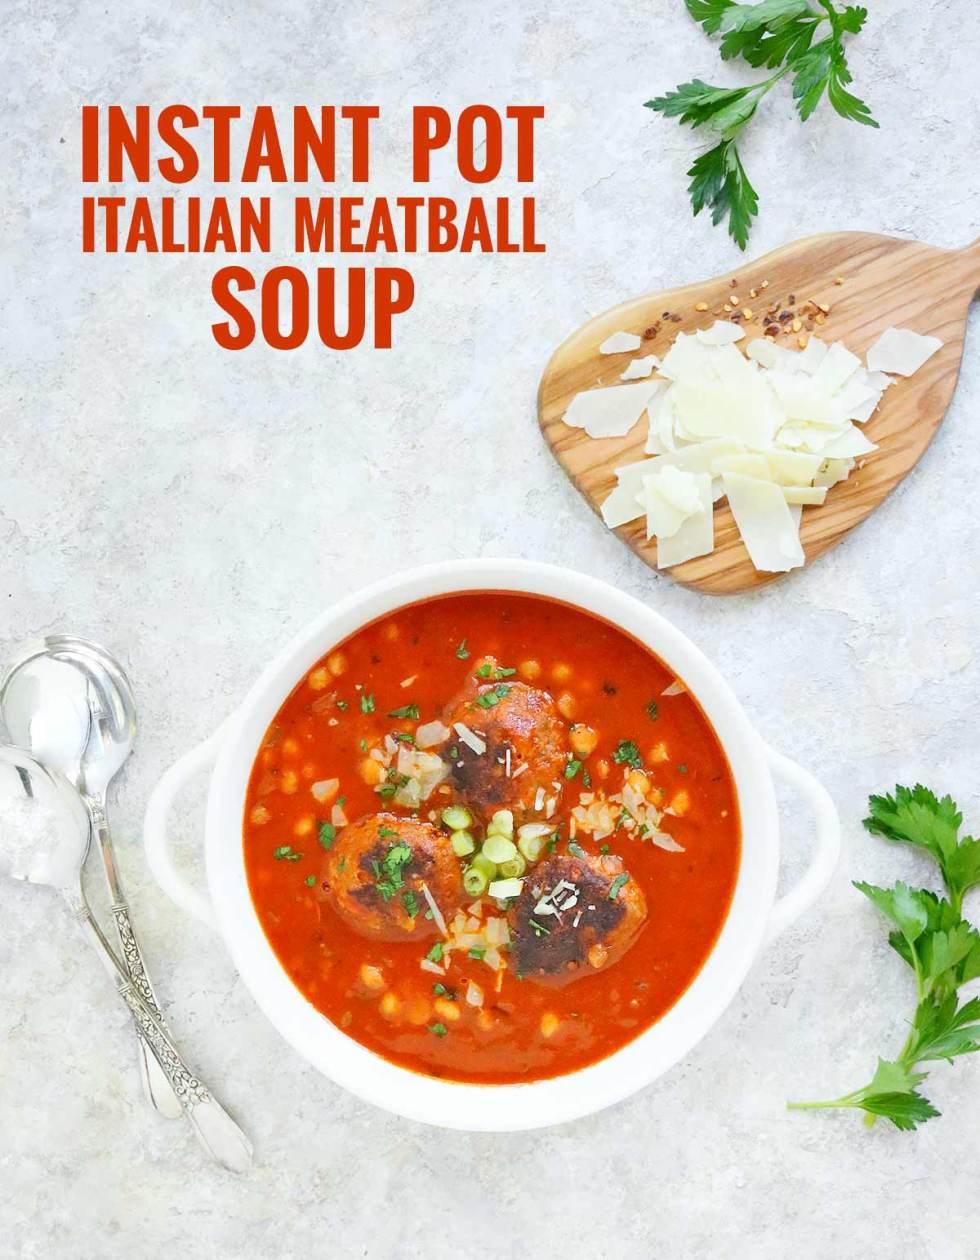 Instant Pot Italian Meatball Soup   Recipe at SoupAddict.com